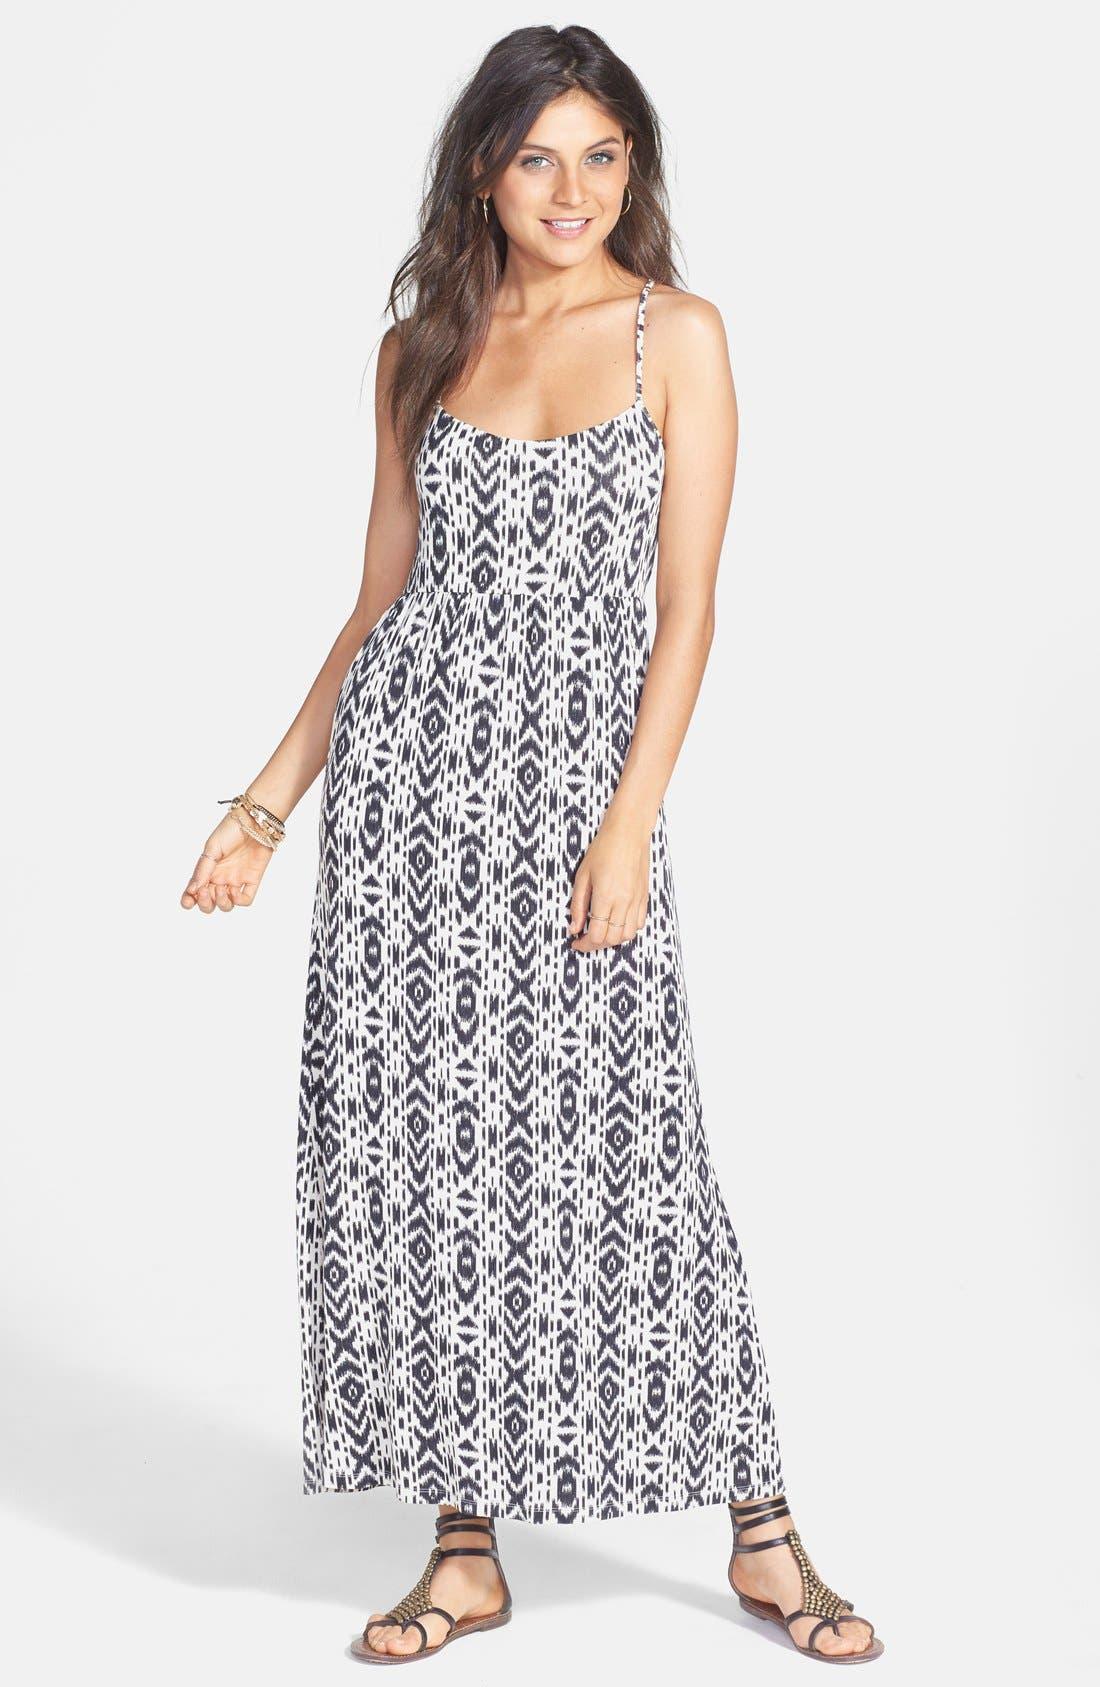 Alternate Image 1 Selected - Volcom 'Play Along' Print Strap Detail Maxi Dress